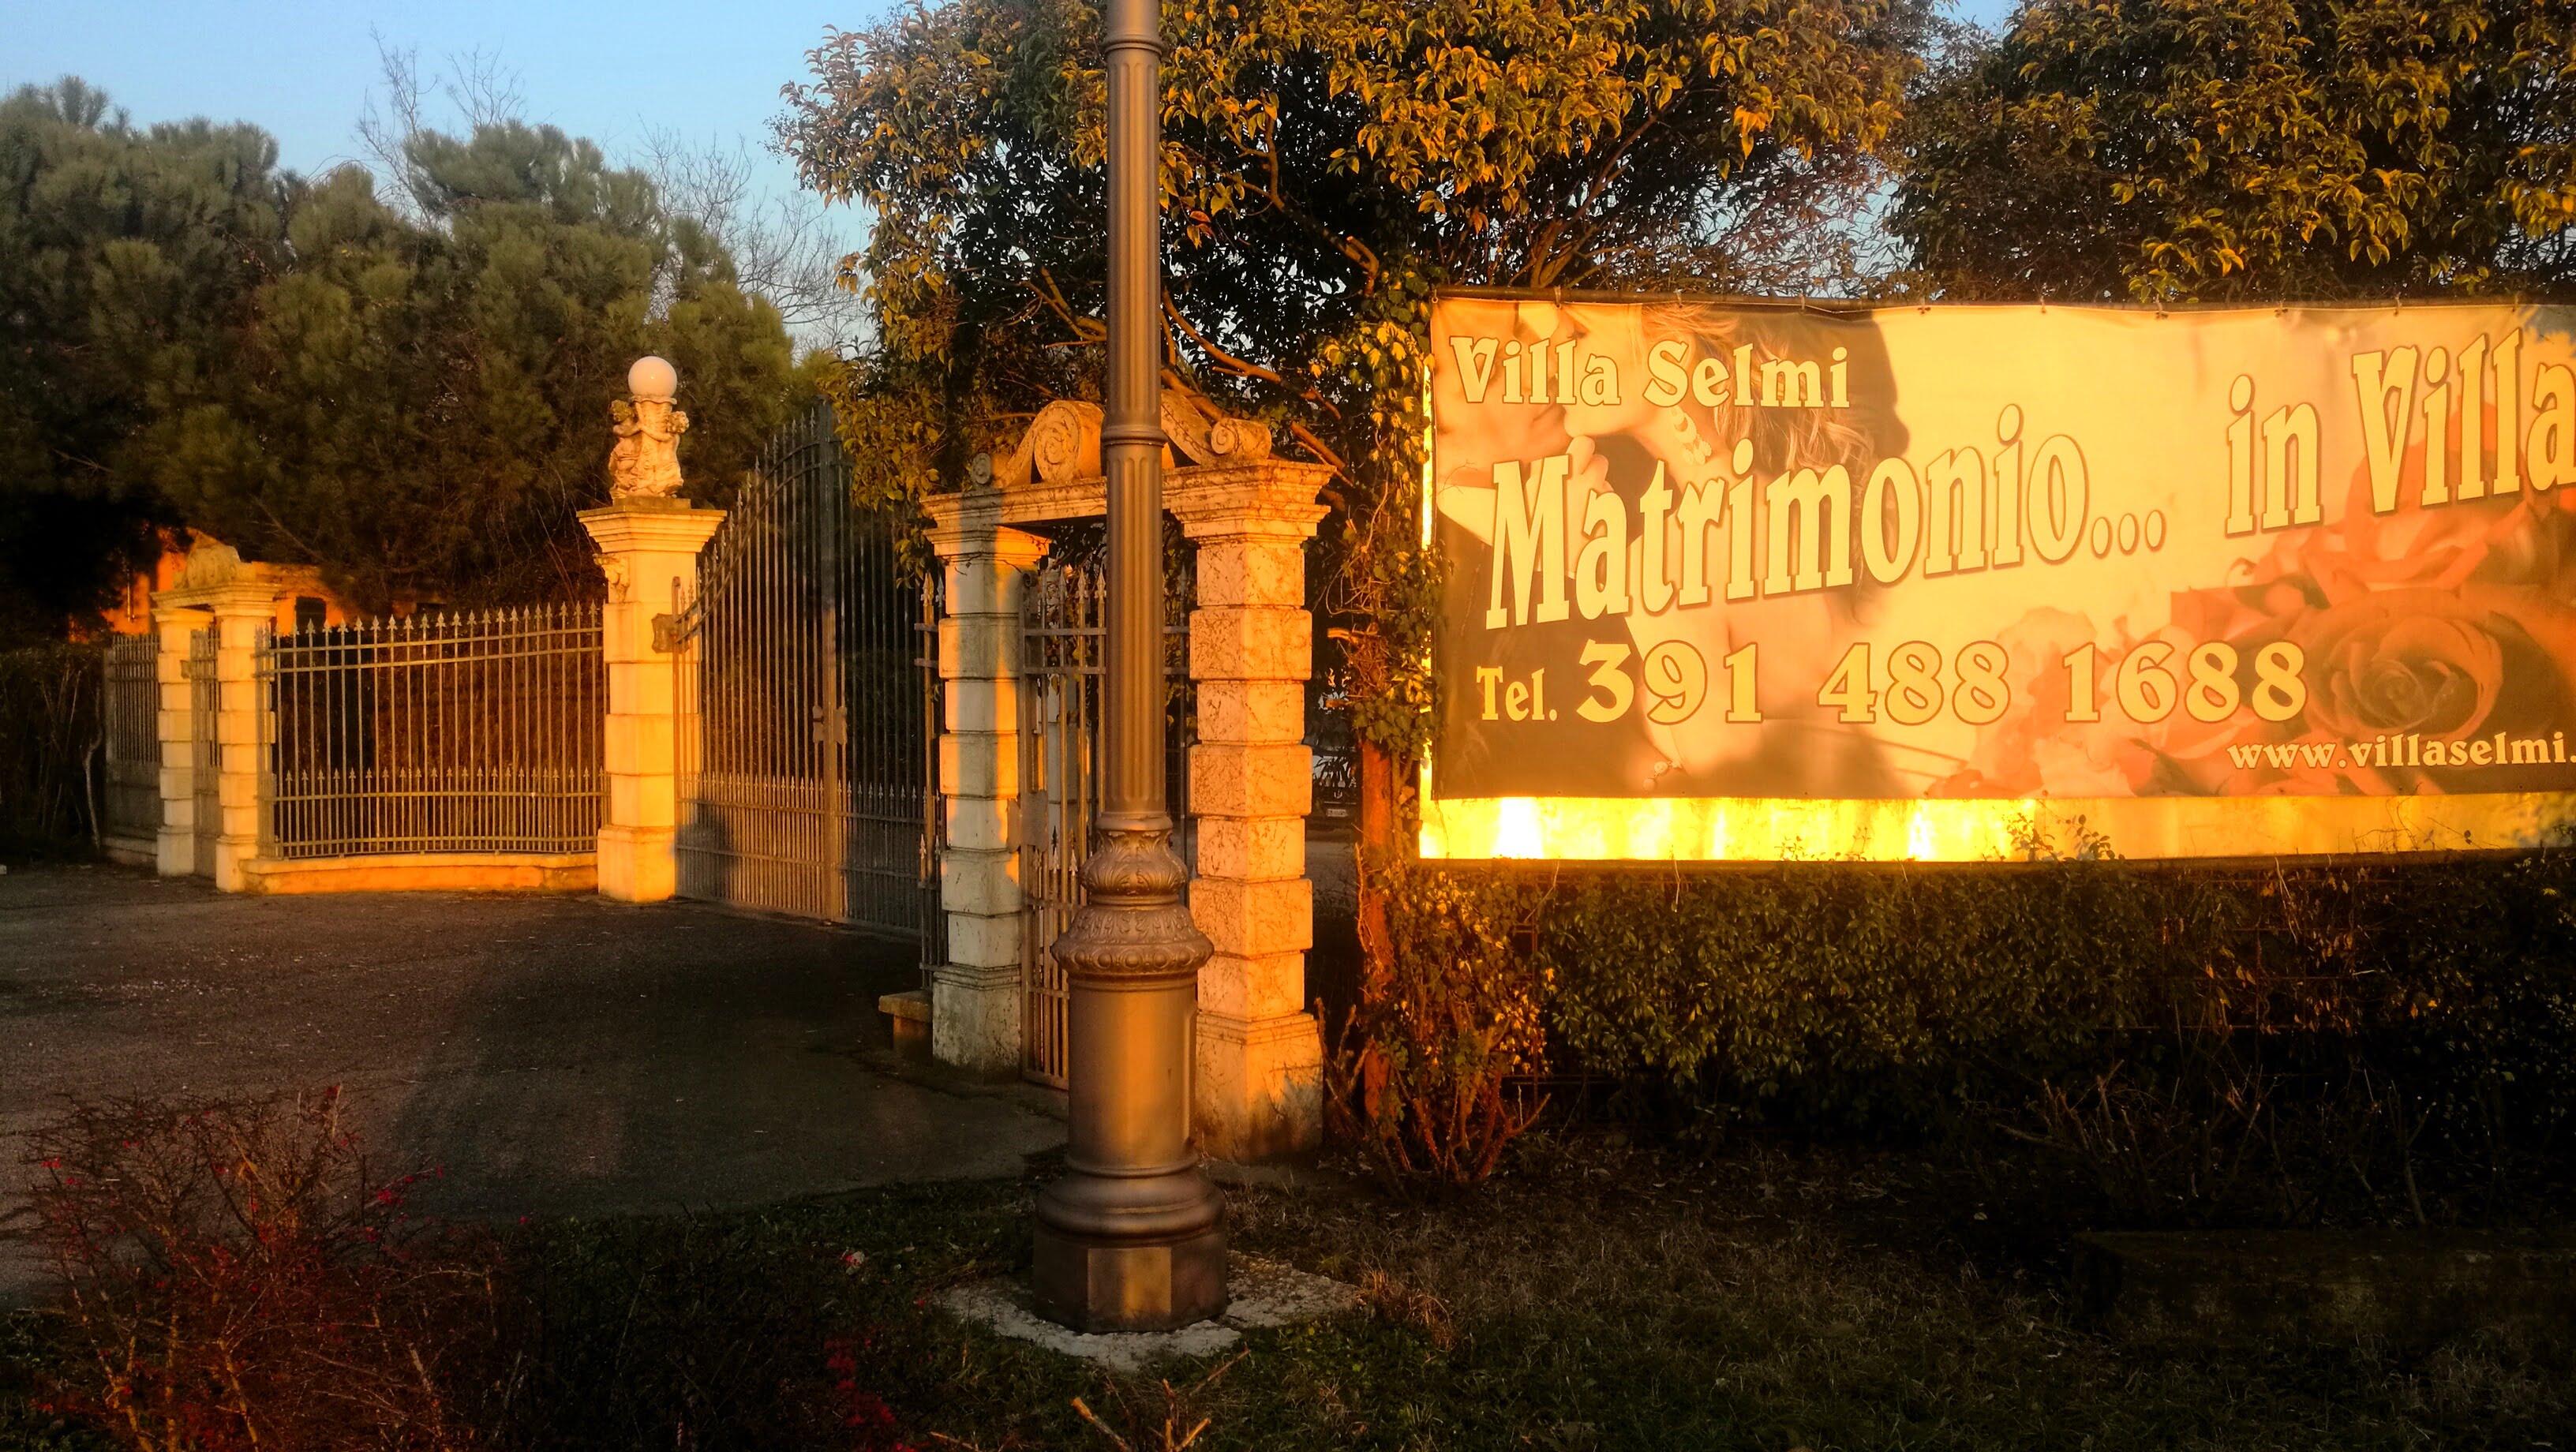 VILLE MATRIMONI CIVILI FERRARA - LOCATION ESCLUSIVA